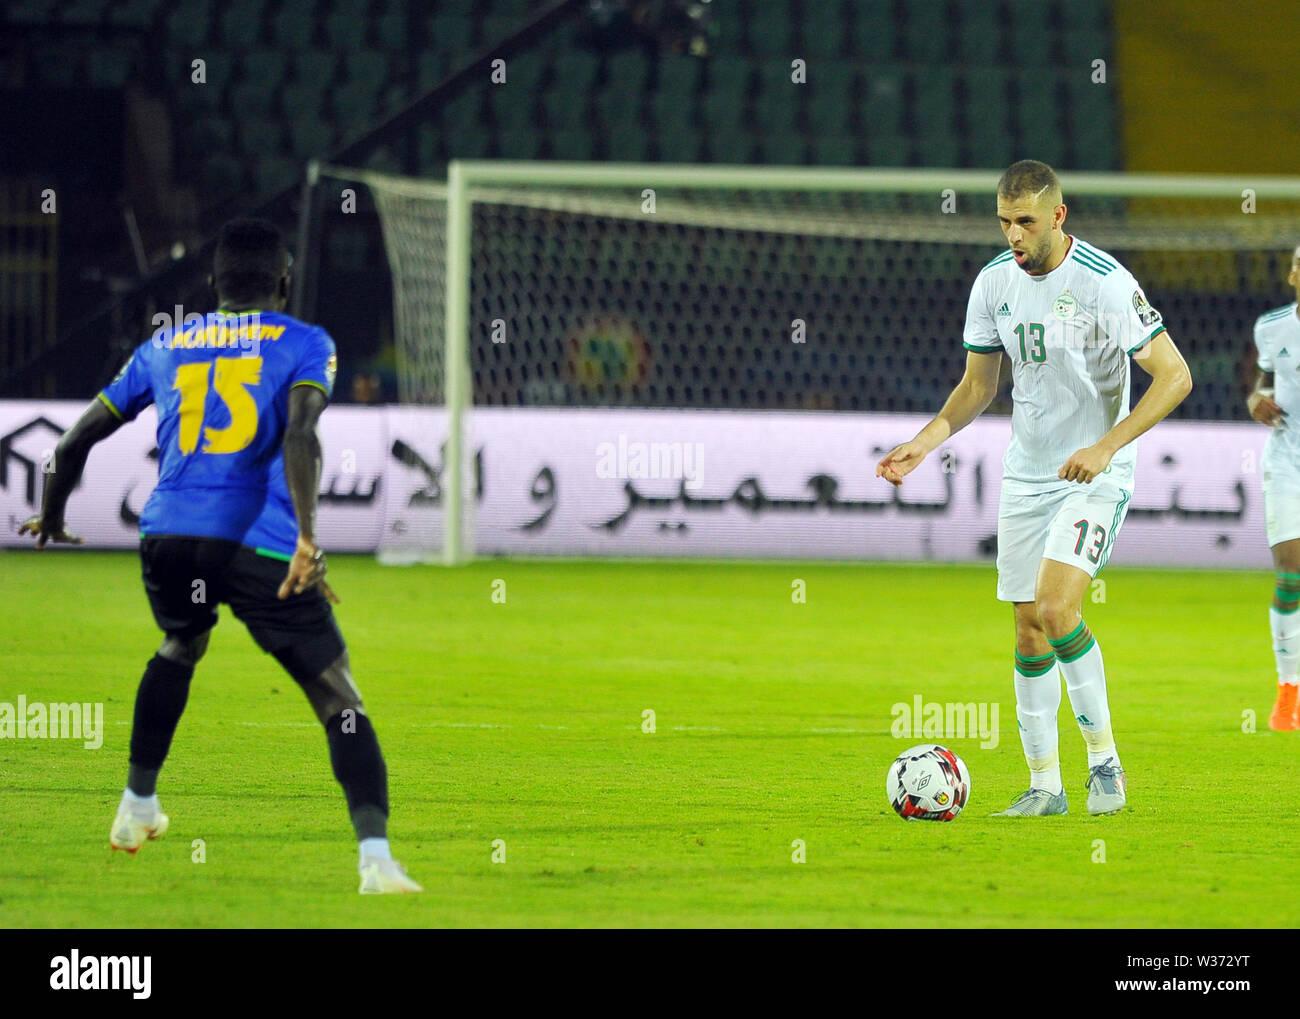 July 1, 2019 - Cairo, Egypt - Islam Slimani (13) Algerian player during the match Tanzania vs Algeria..Total Africa Cup of Nations Egypt 2019 at the Al Salam  stadium  of Cairo.photo: Chokri Mahjoub (Credit Image: © Chokri Mahjoub/ZUMA Wire) - Stock Image